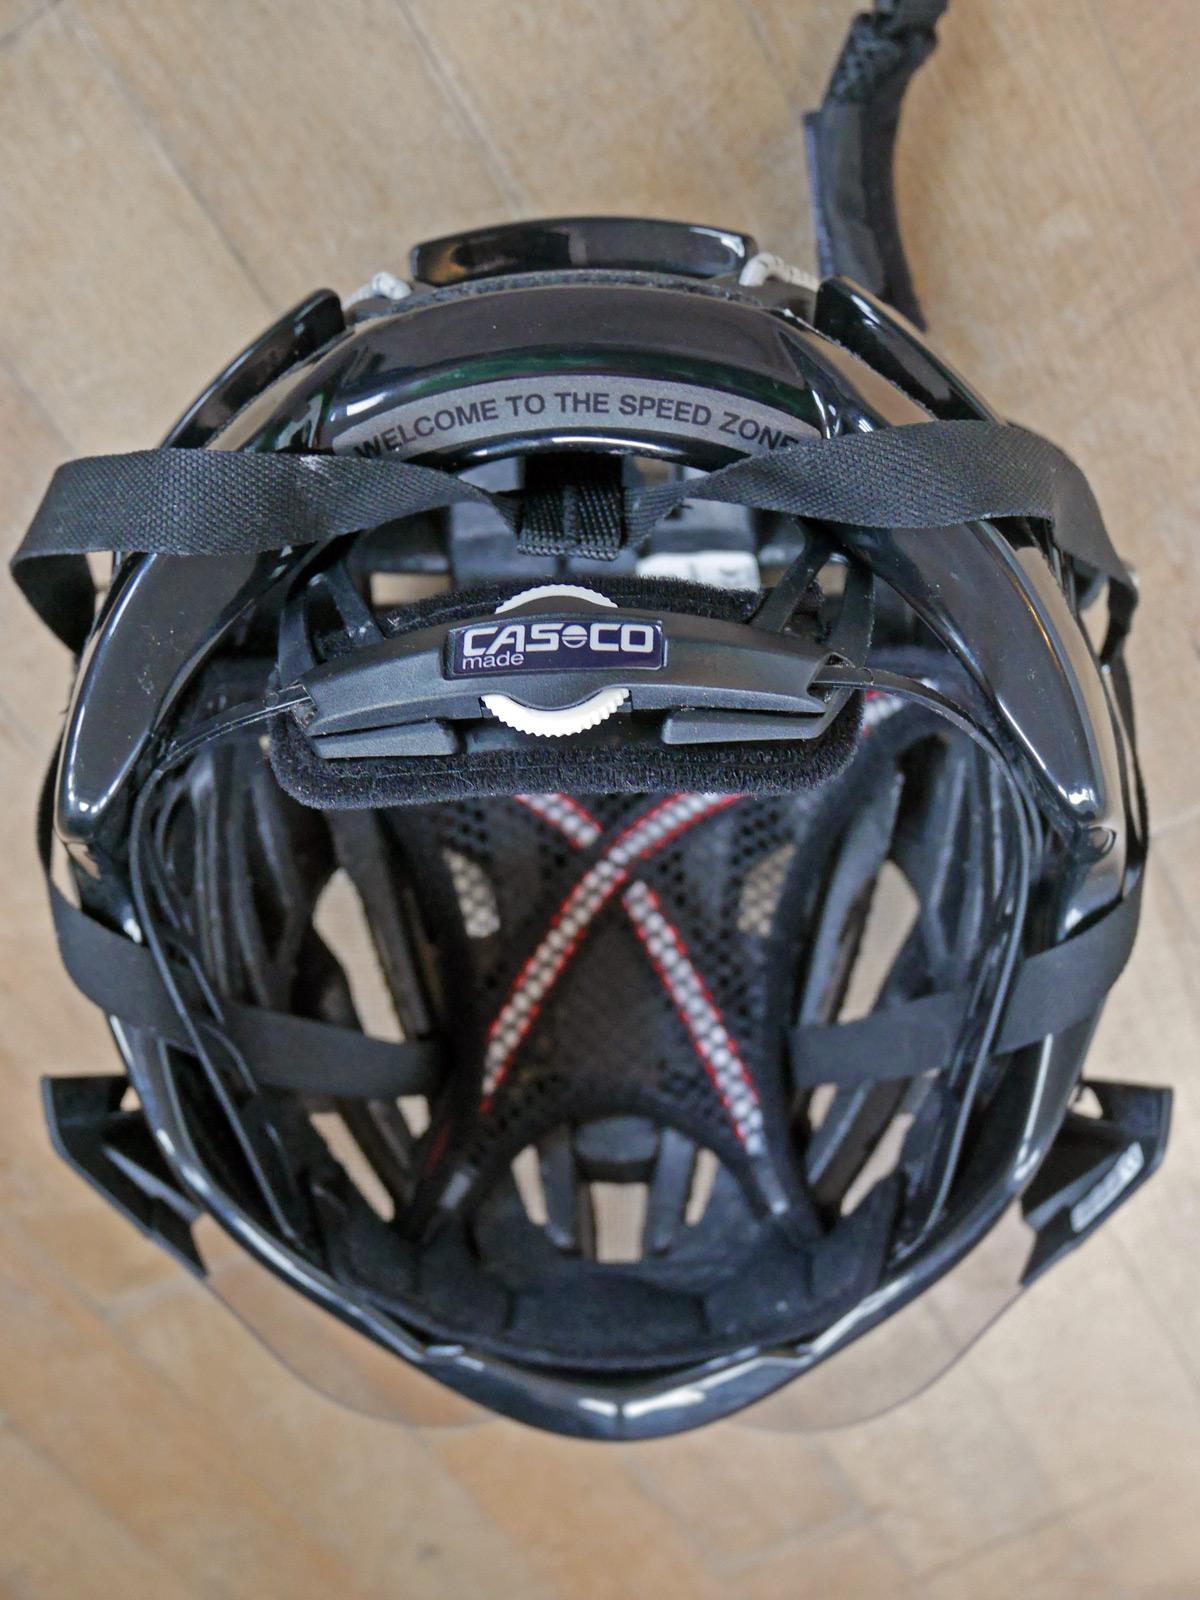 Casco_Speed-Airo-TCS-aero-road-helmet_rear-retention